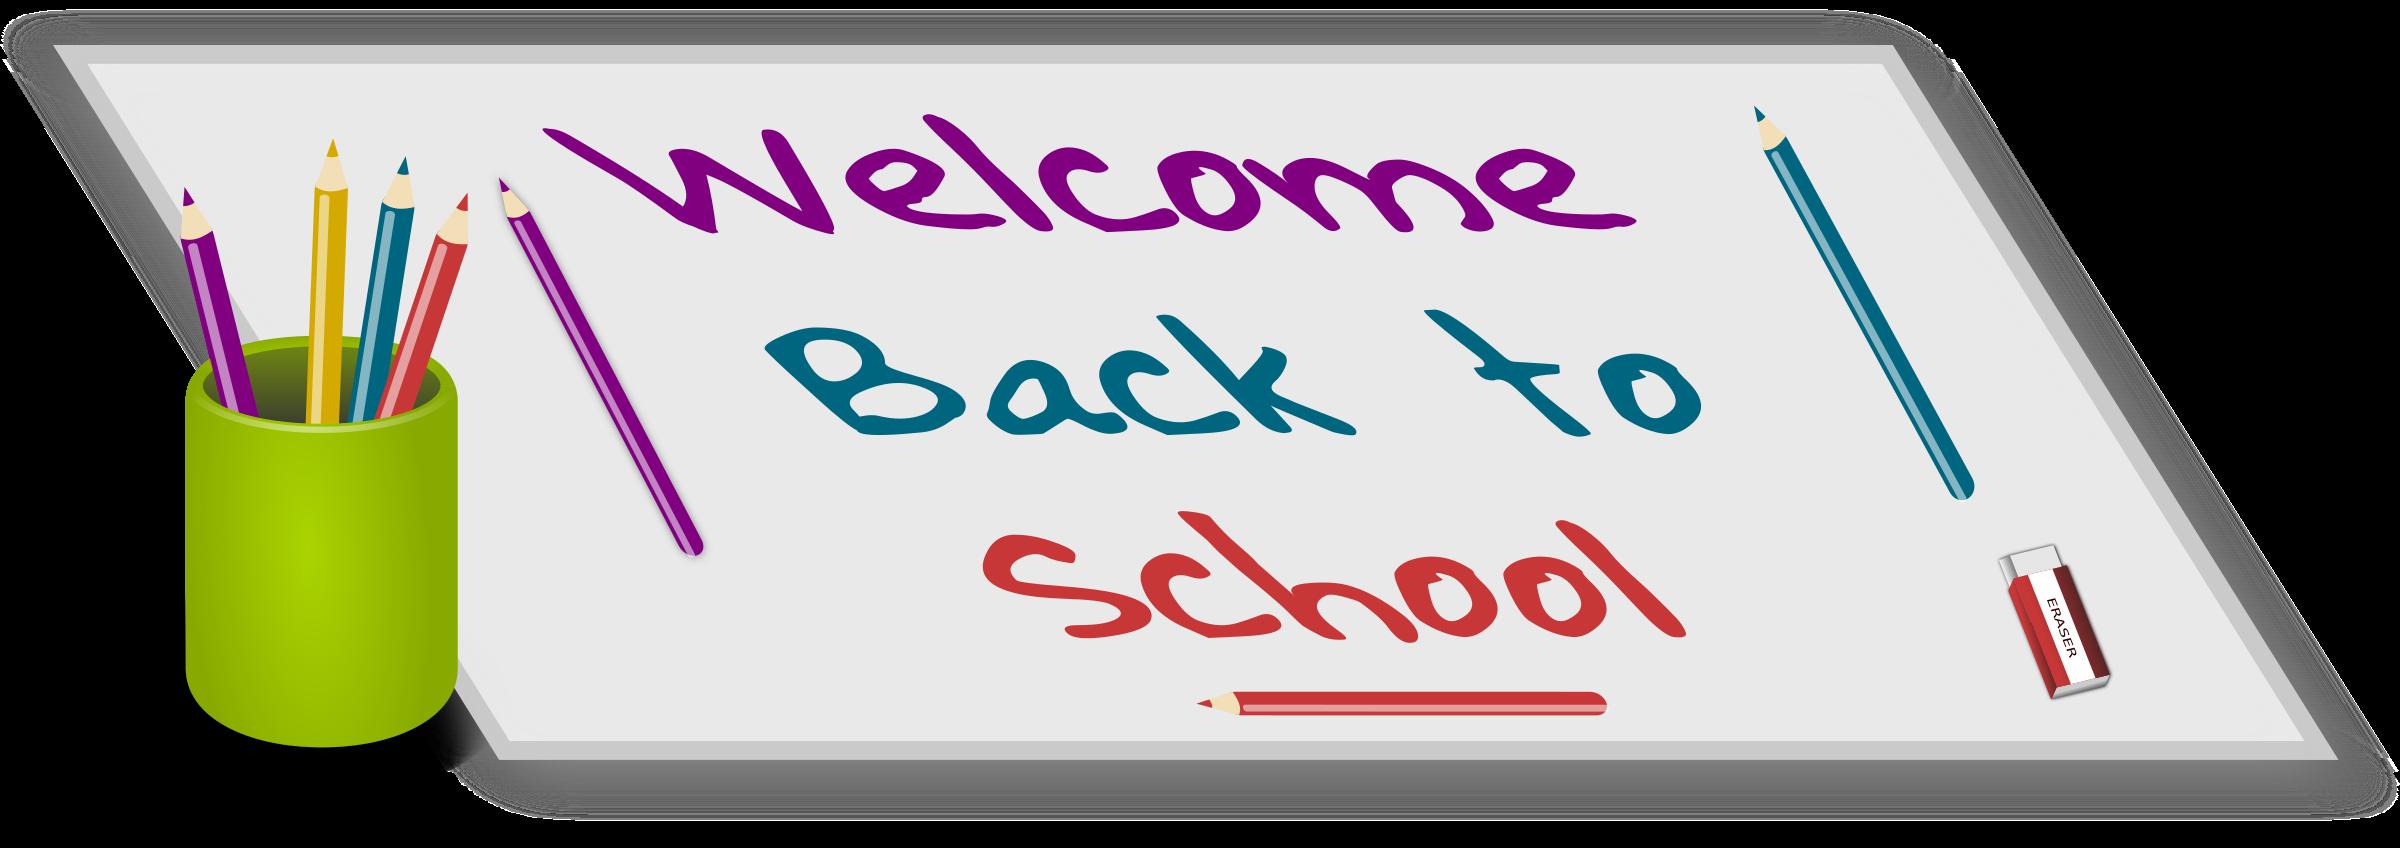 Welcome back to school. Eraser clipart big pink